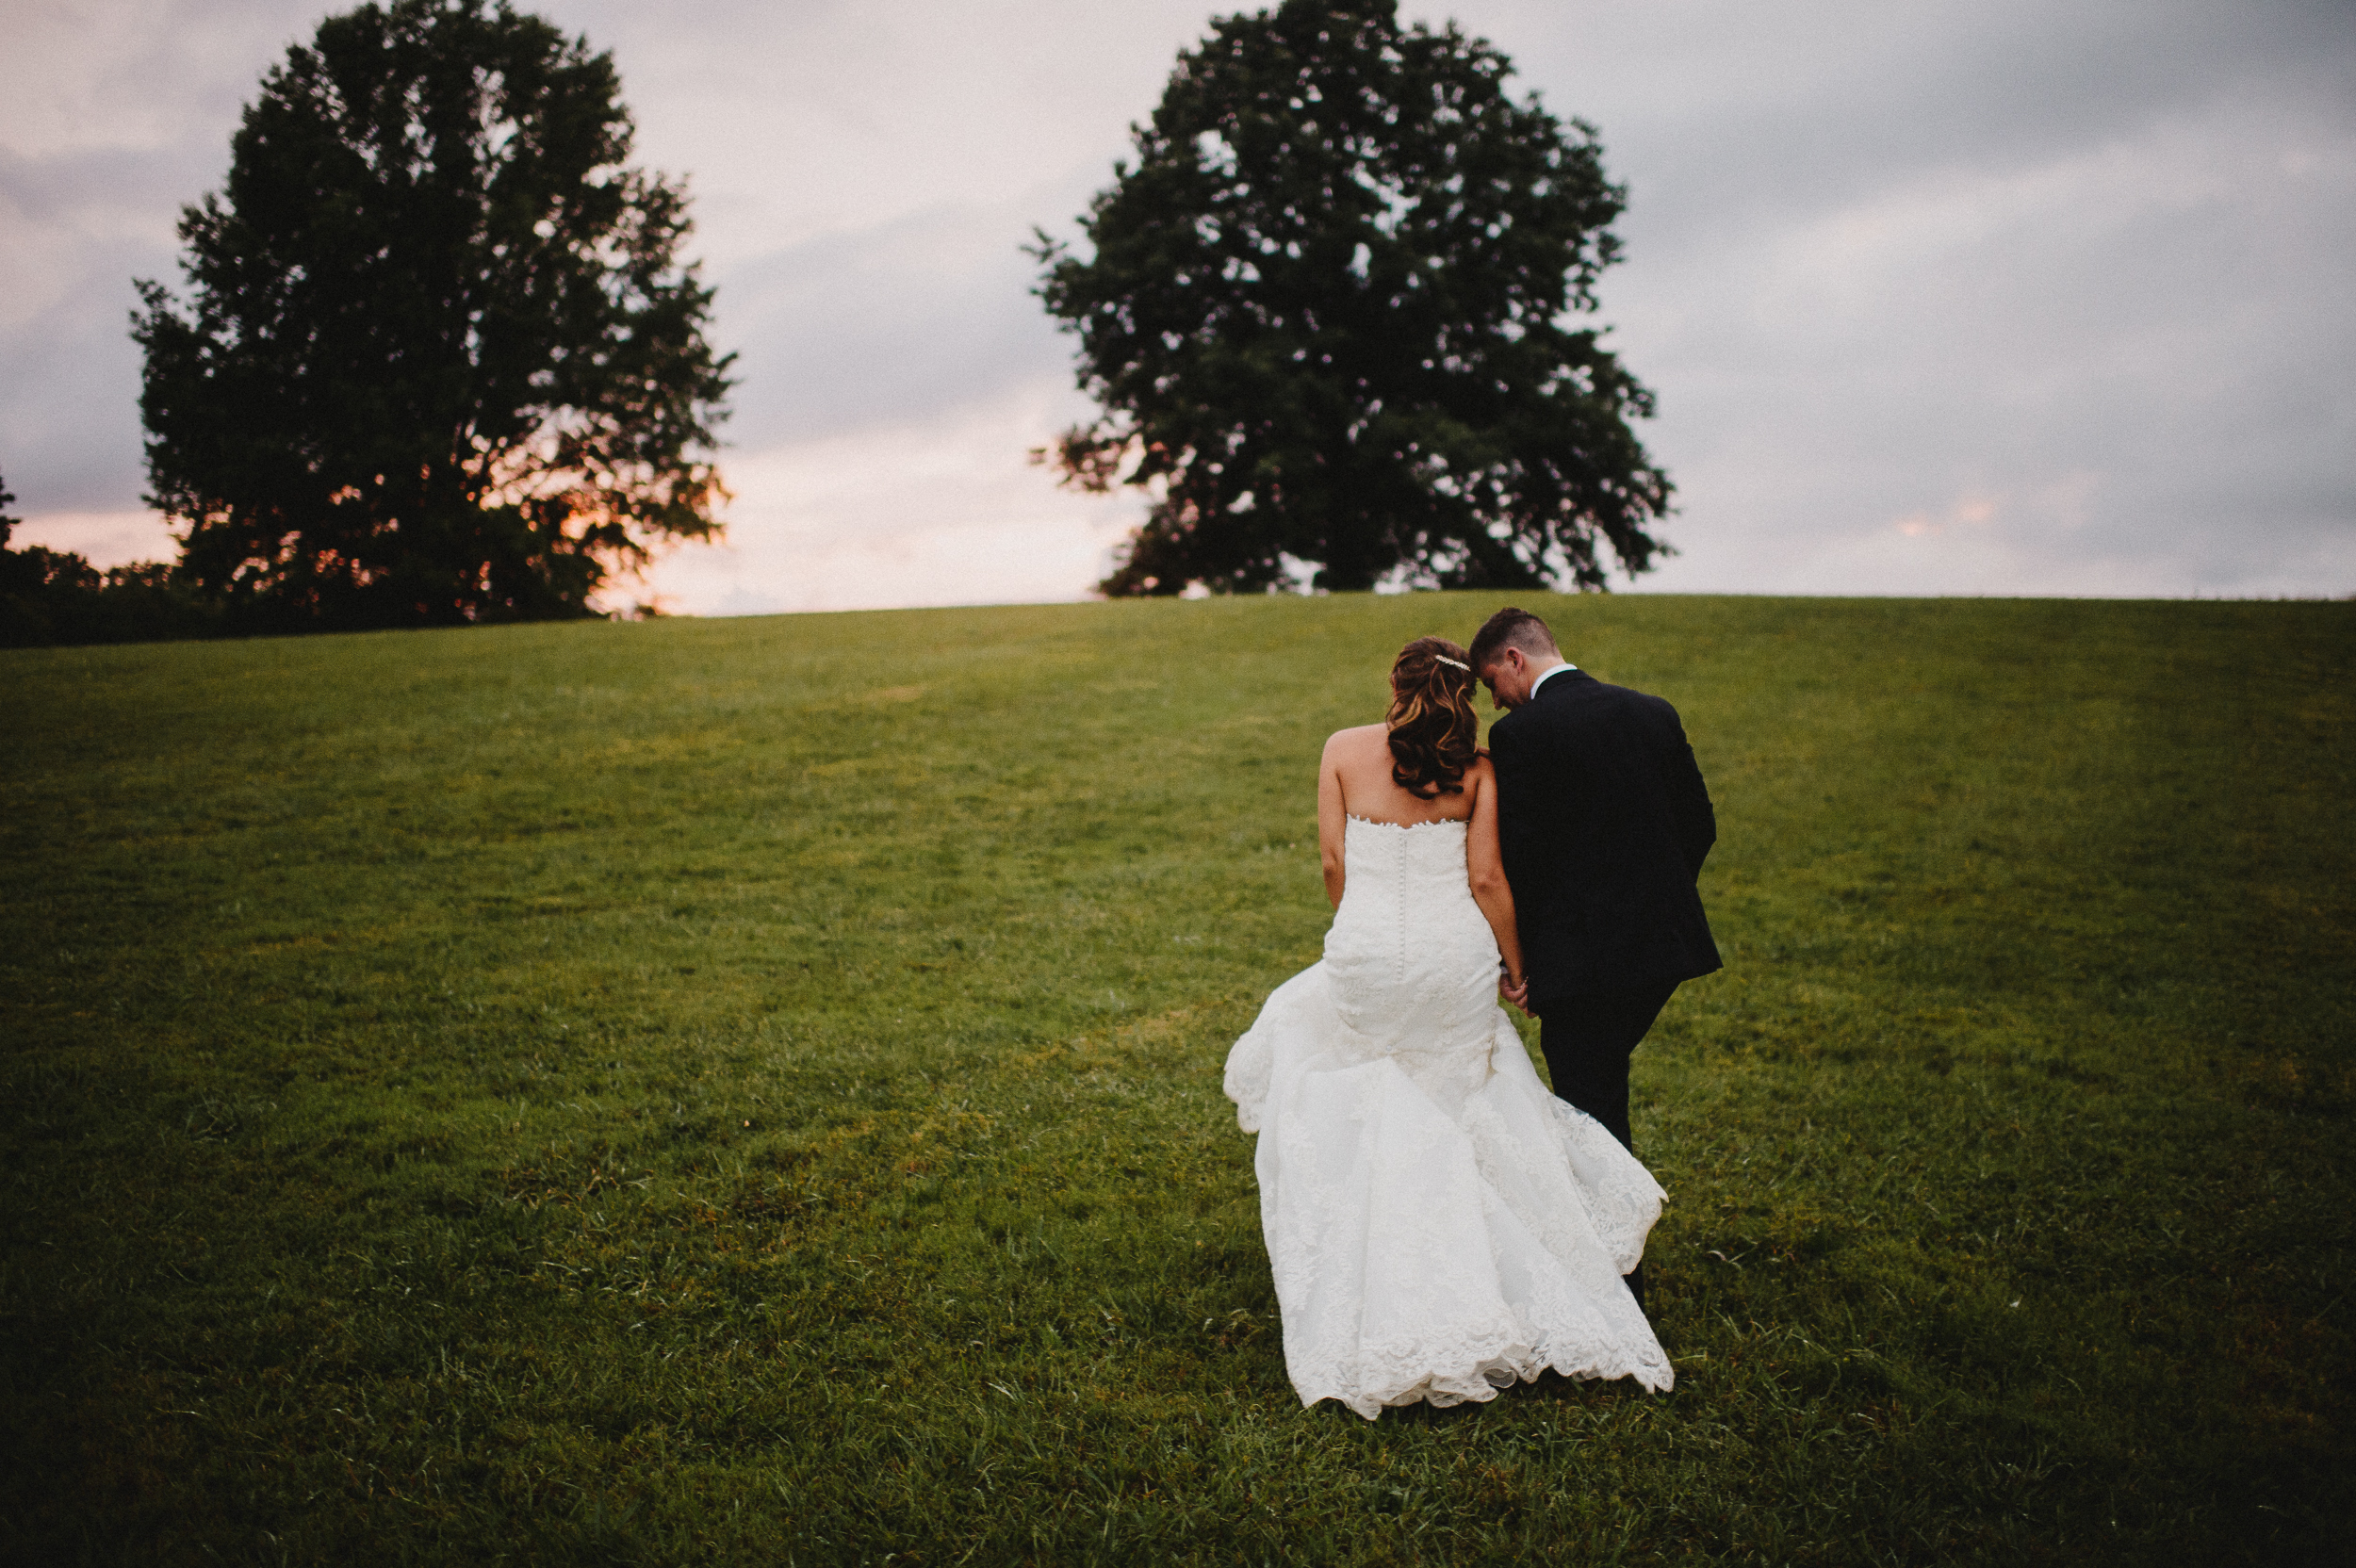 delaware-estate-wedding-photographer-pat-robinson-photography-101.jpg